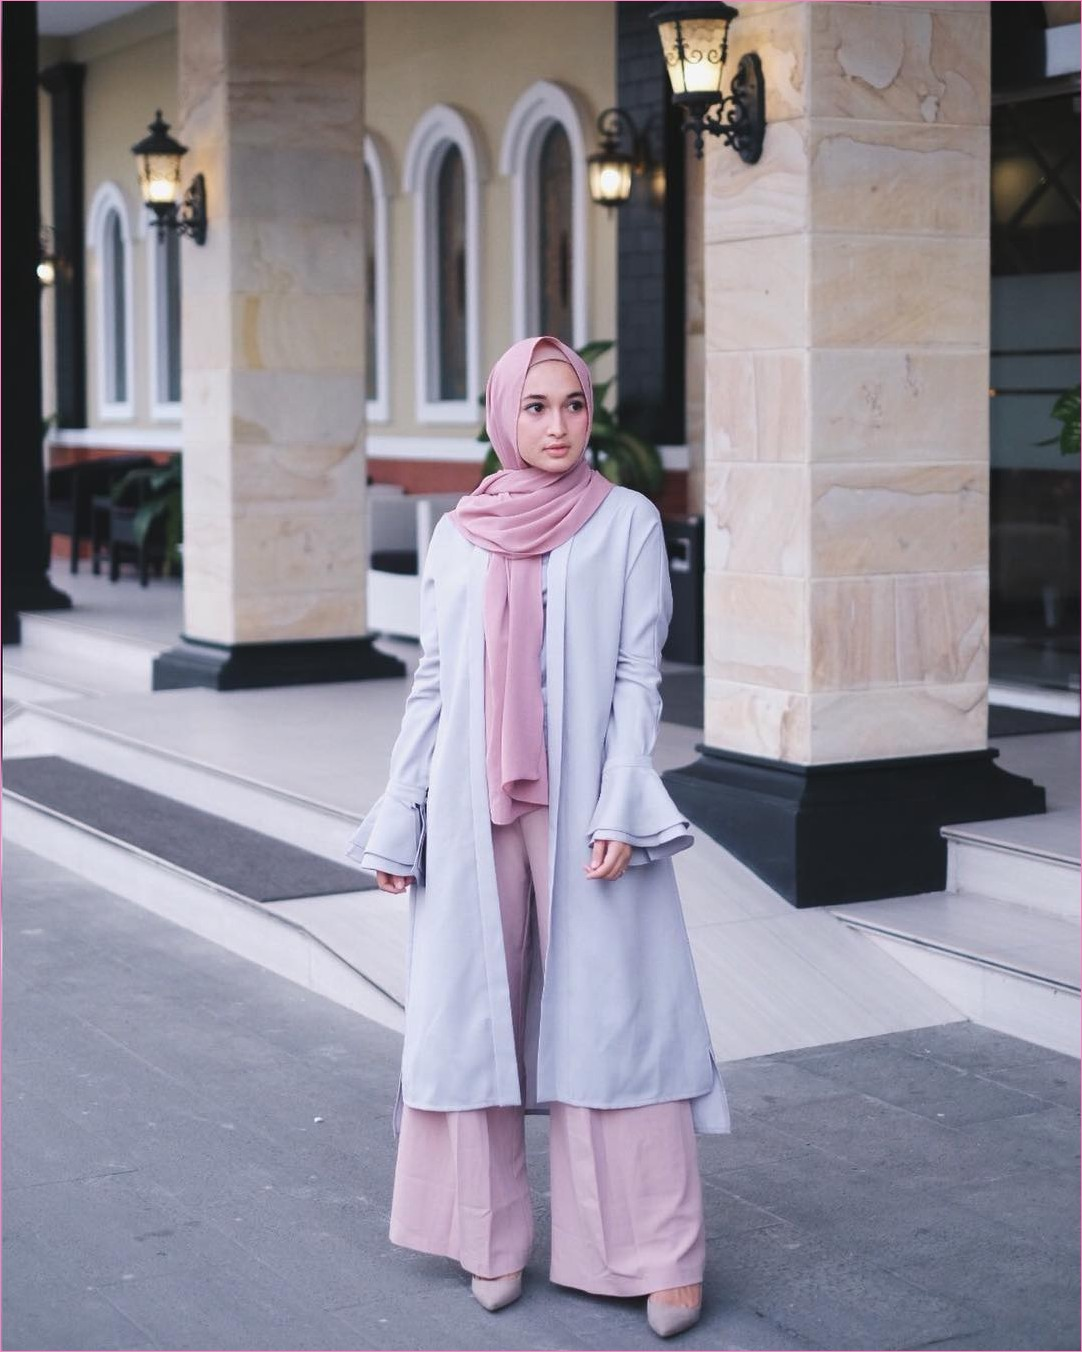 Outfit Kerudung Pashmina Ala Selebgram 2018 hijab pashmina diamond pink muda ciput rajut outer cardigan lengan terompet abu muda t-shirt celana cullotes pink pallazo high heels krem wedges ootd trendy kekinian lampu keramik